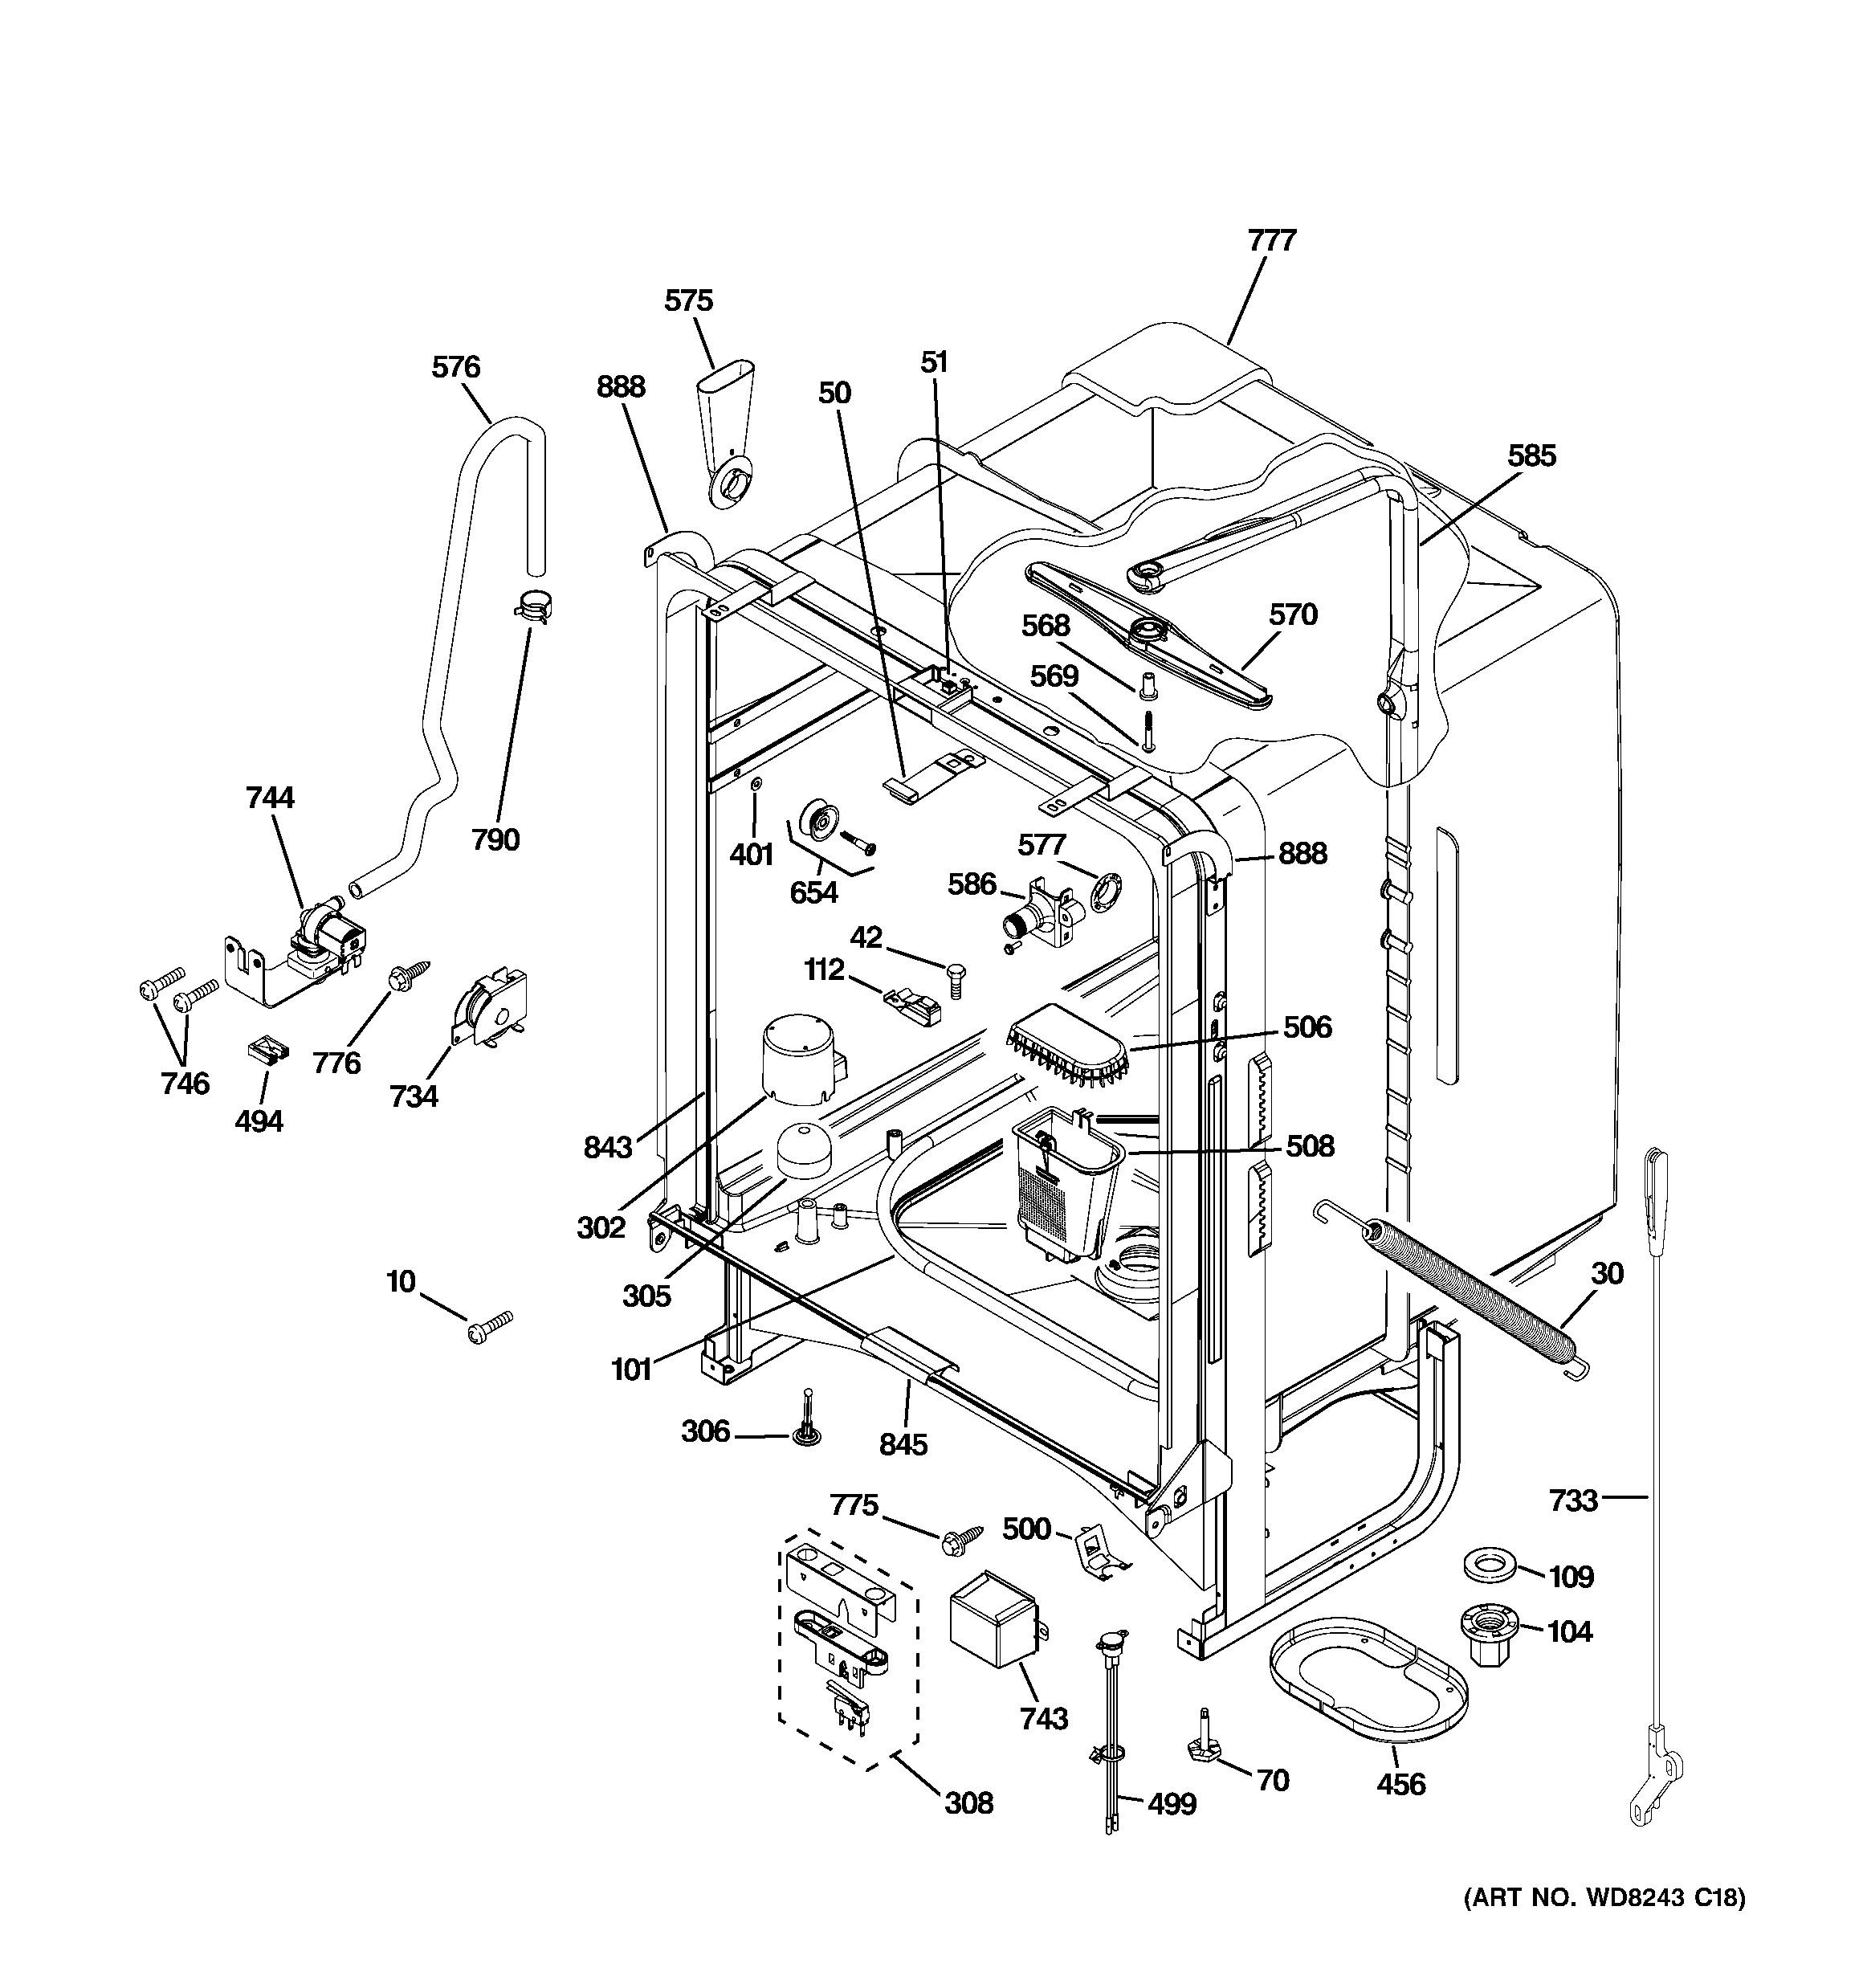 ge nautilus dishwasher parts diagram ge dishwasher diagram wiring rh detoxicrecenze com GE Nautilus Portable Dishwasher Manual GE Nautilus Dishwasher Parts